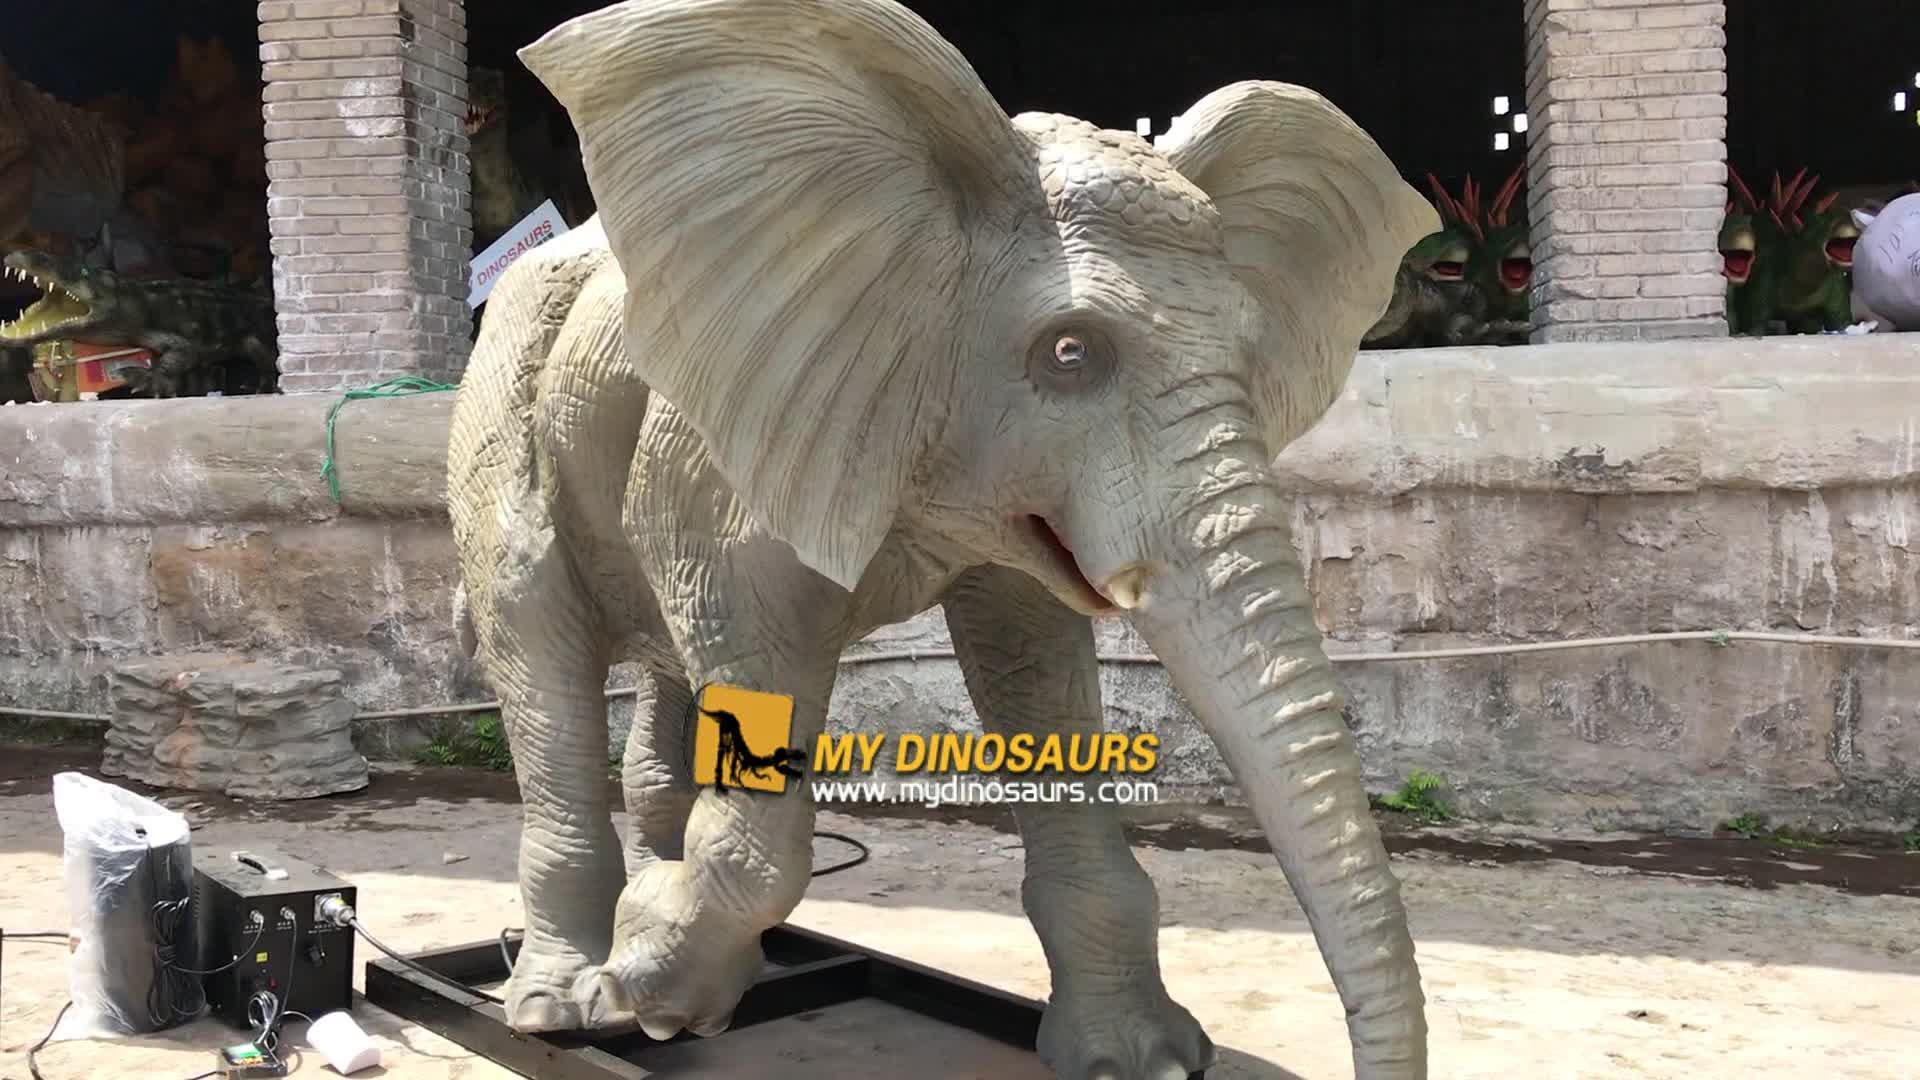 My-dino electric animals elephant figurines for zoo